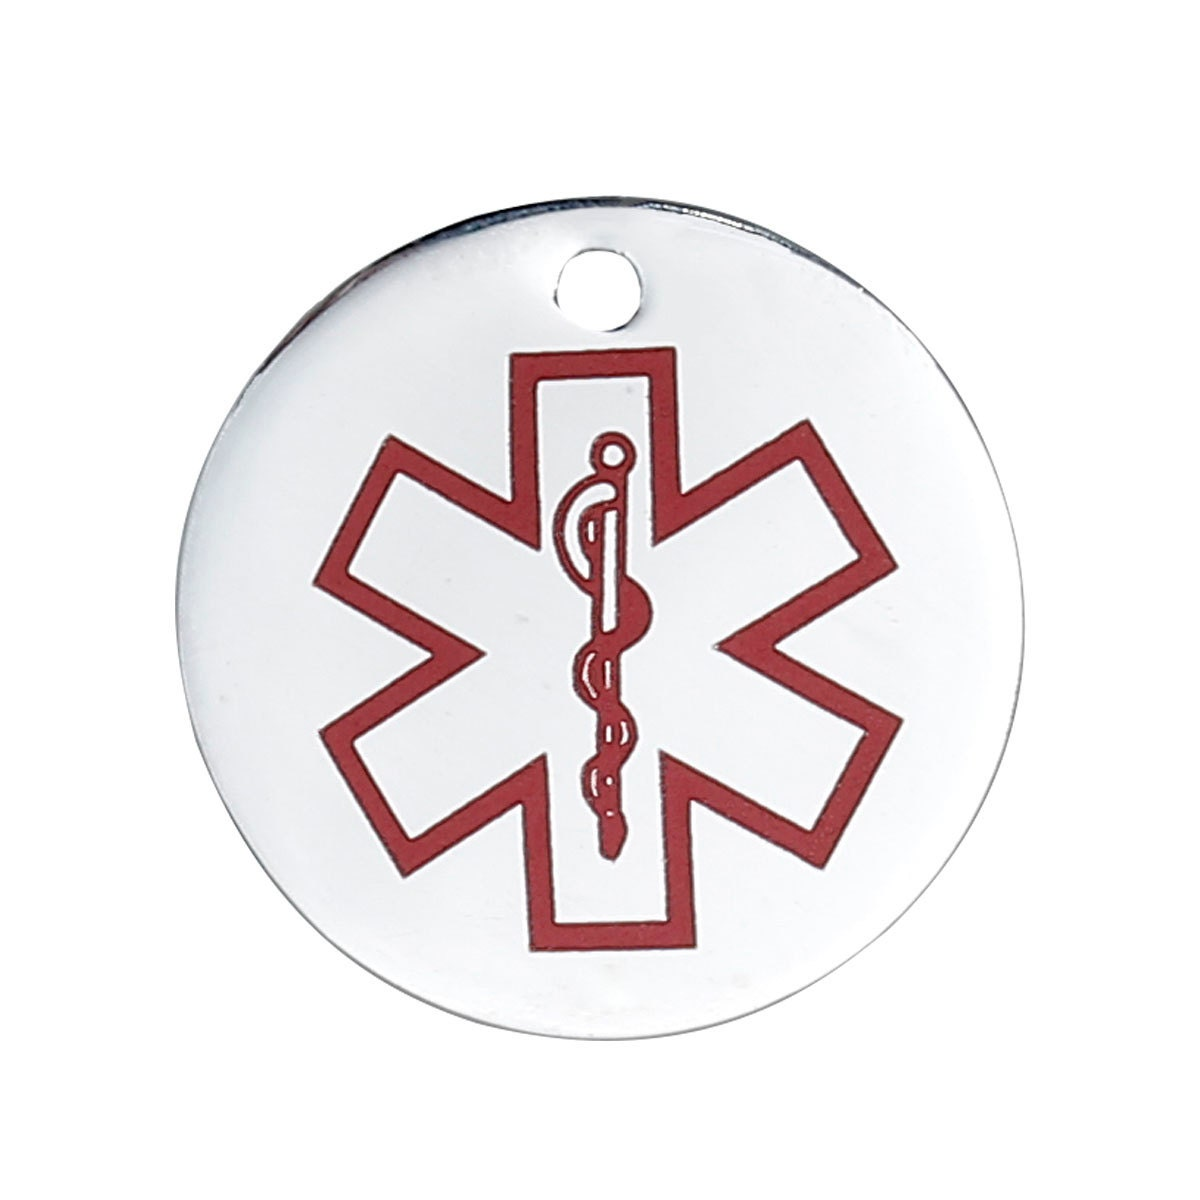 2 caduceus medical symbol stainless steel charms nurse charm 425 biocorpaavc